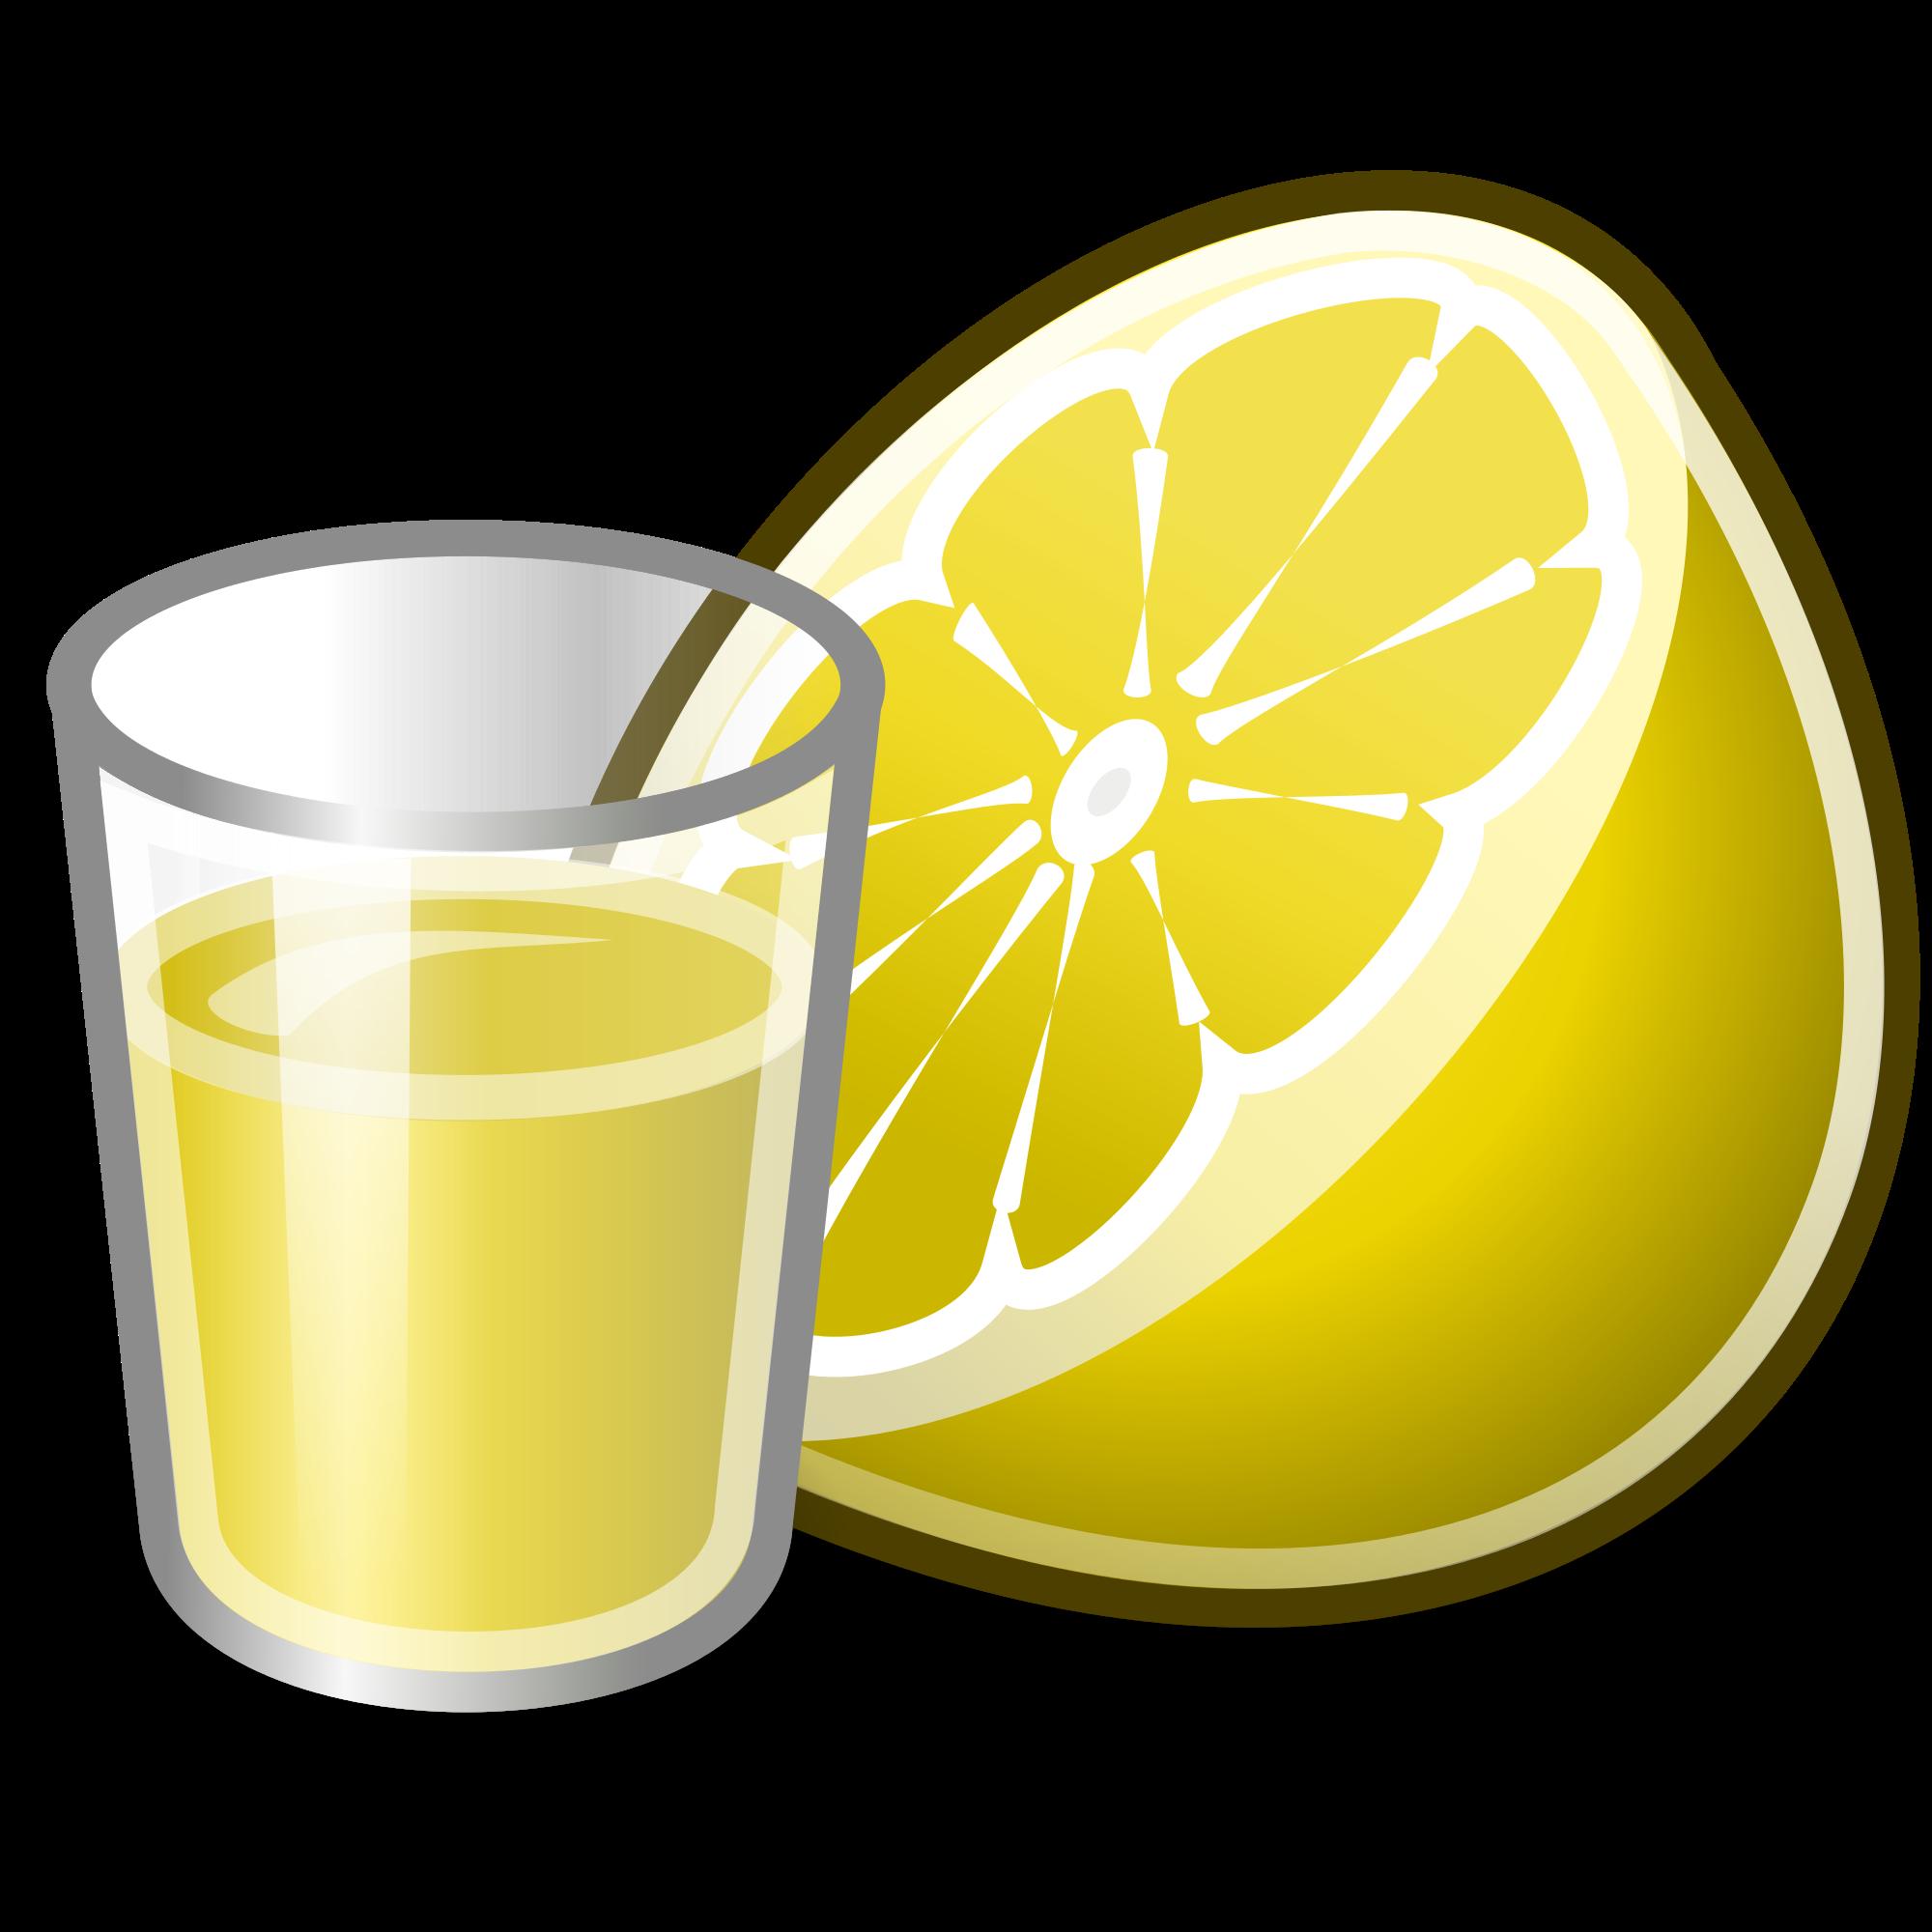 Lemons clipart svg. File tango juice wikimedia